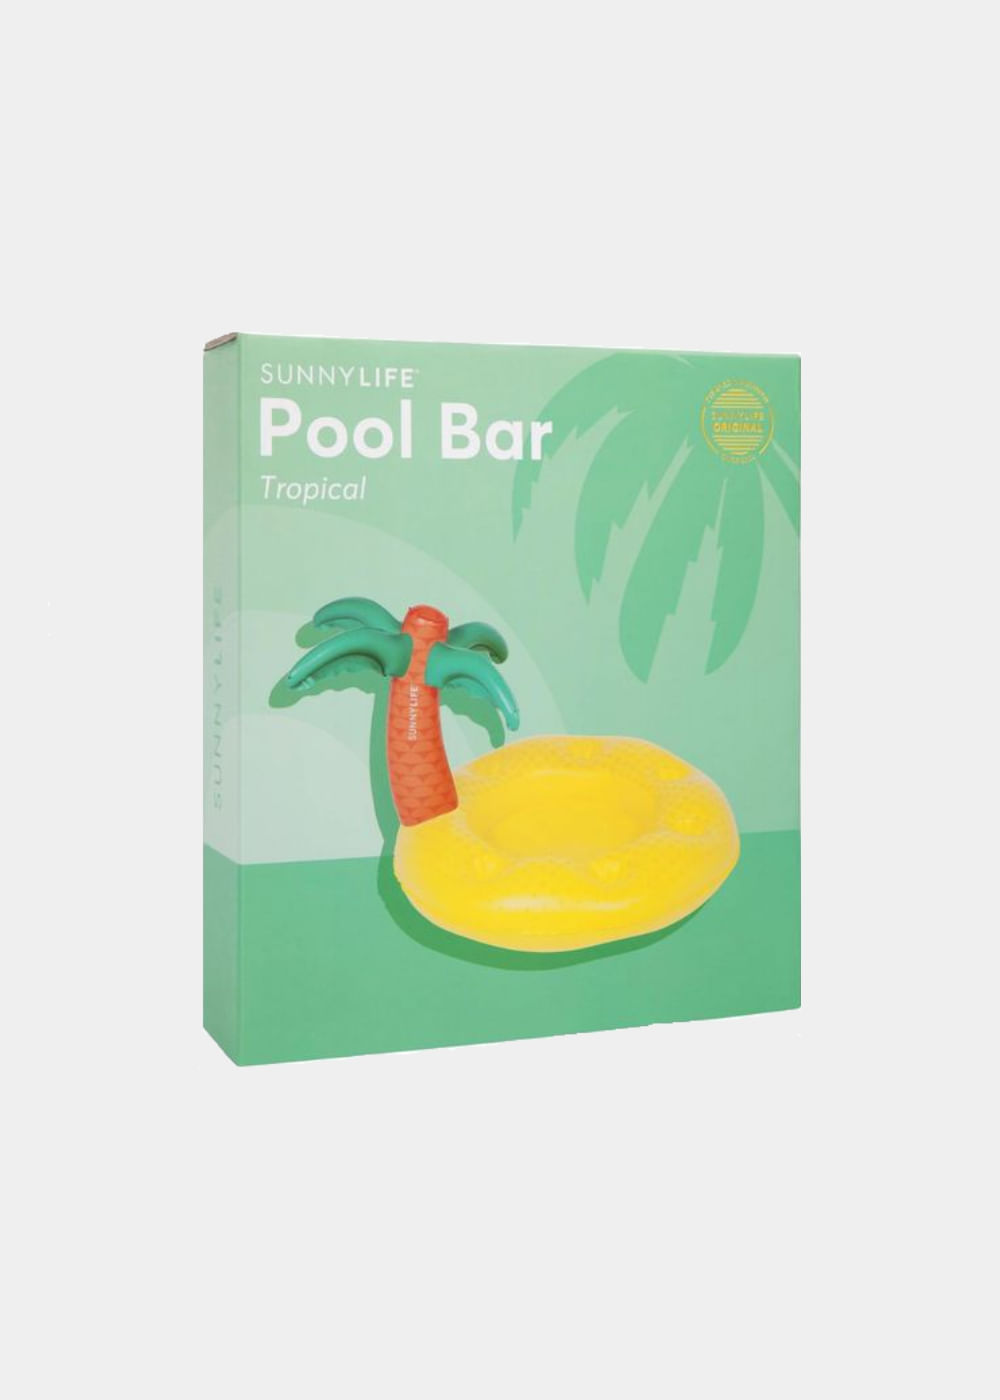 pool-bar-sunnylife